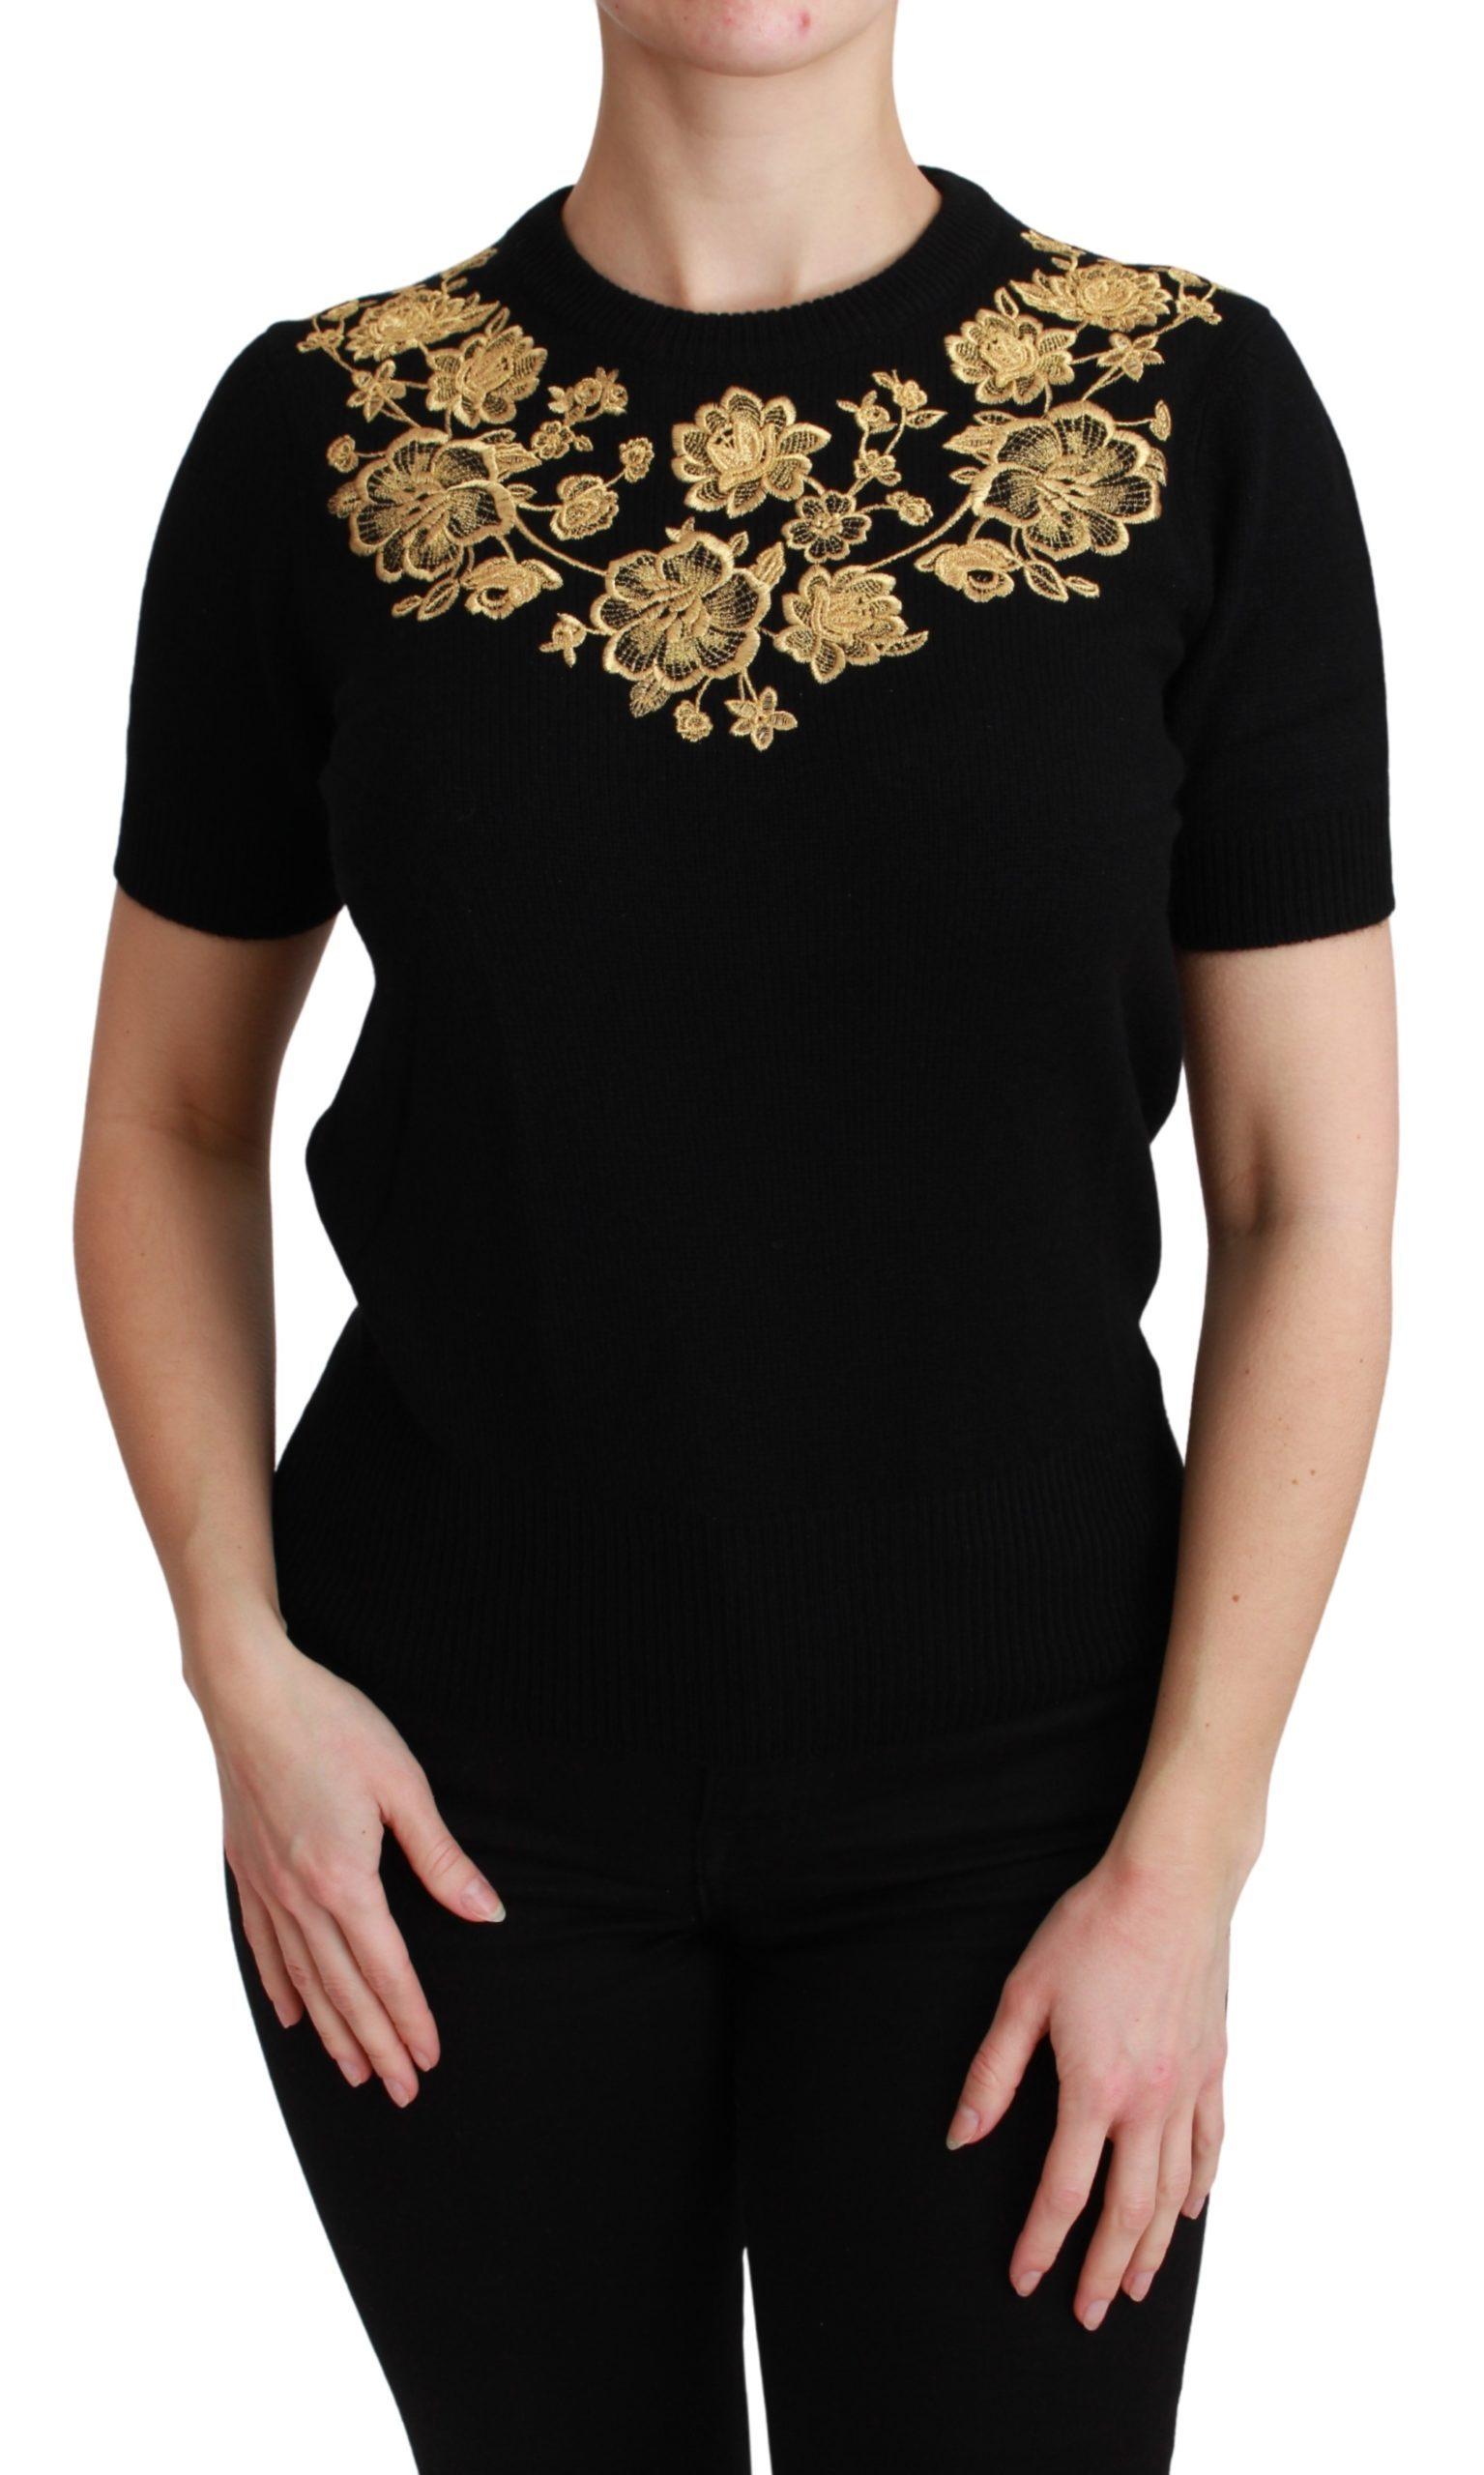 Dolce & Gabbana Women's Cashmere Gold Floral Sweater Black TSH4588 - IT40|S